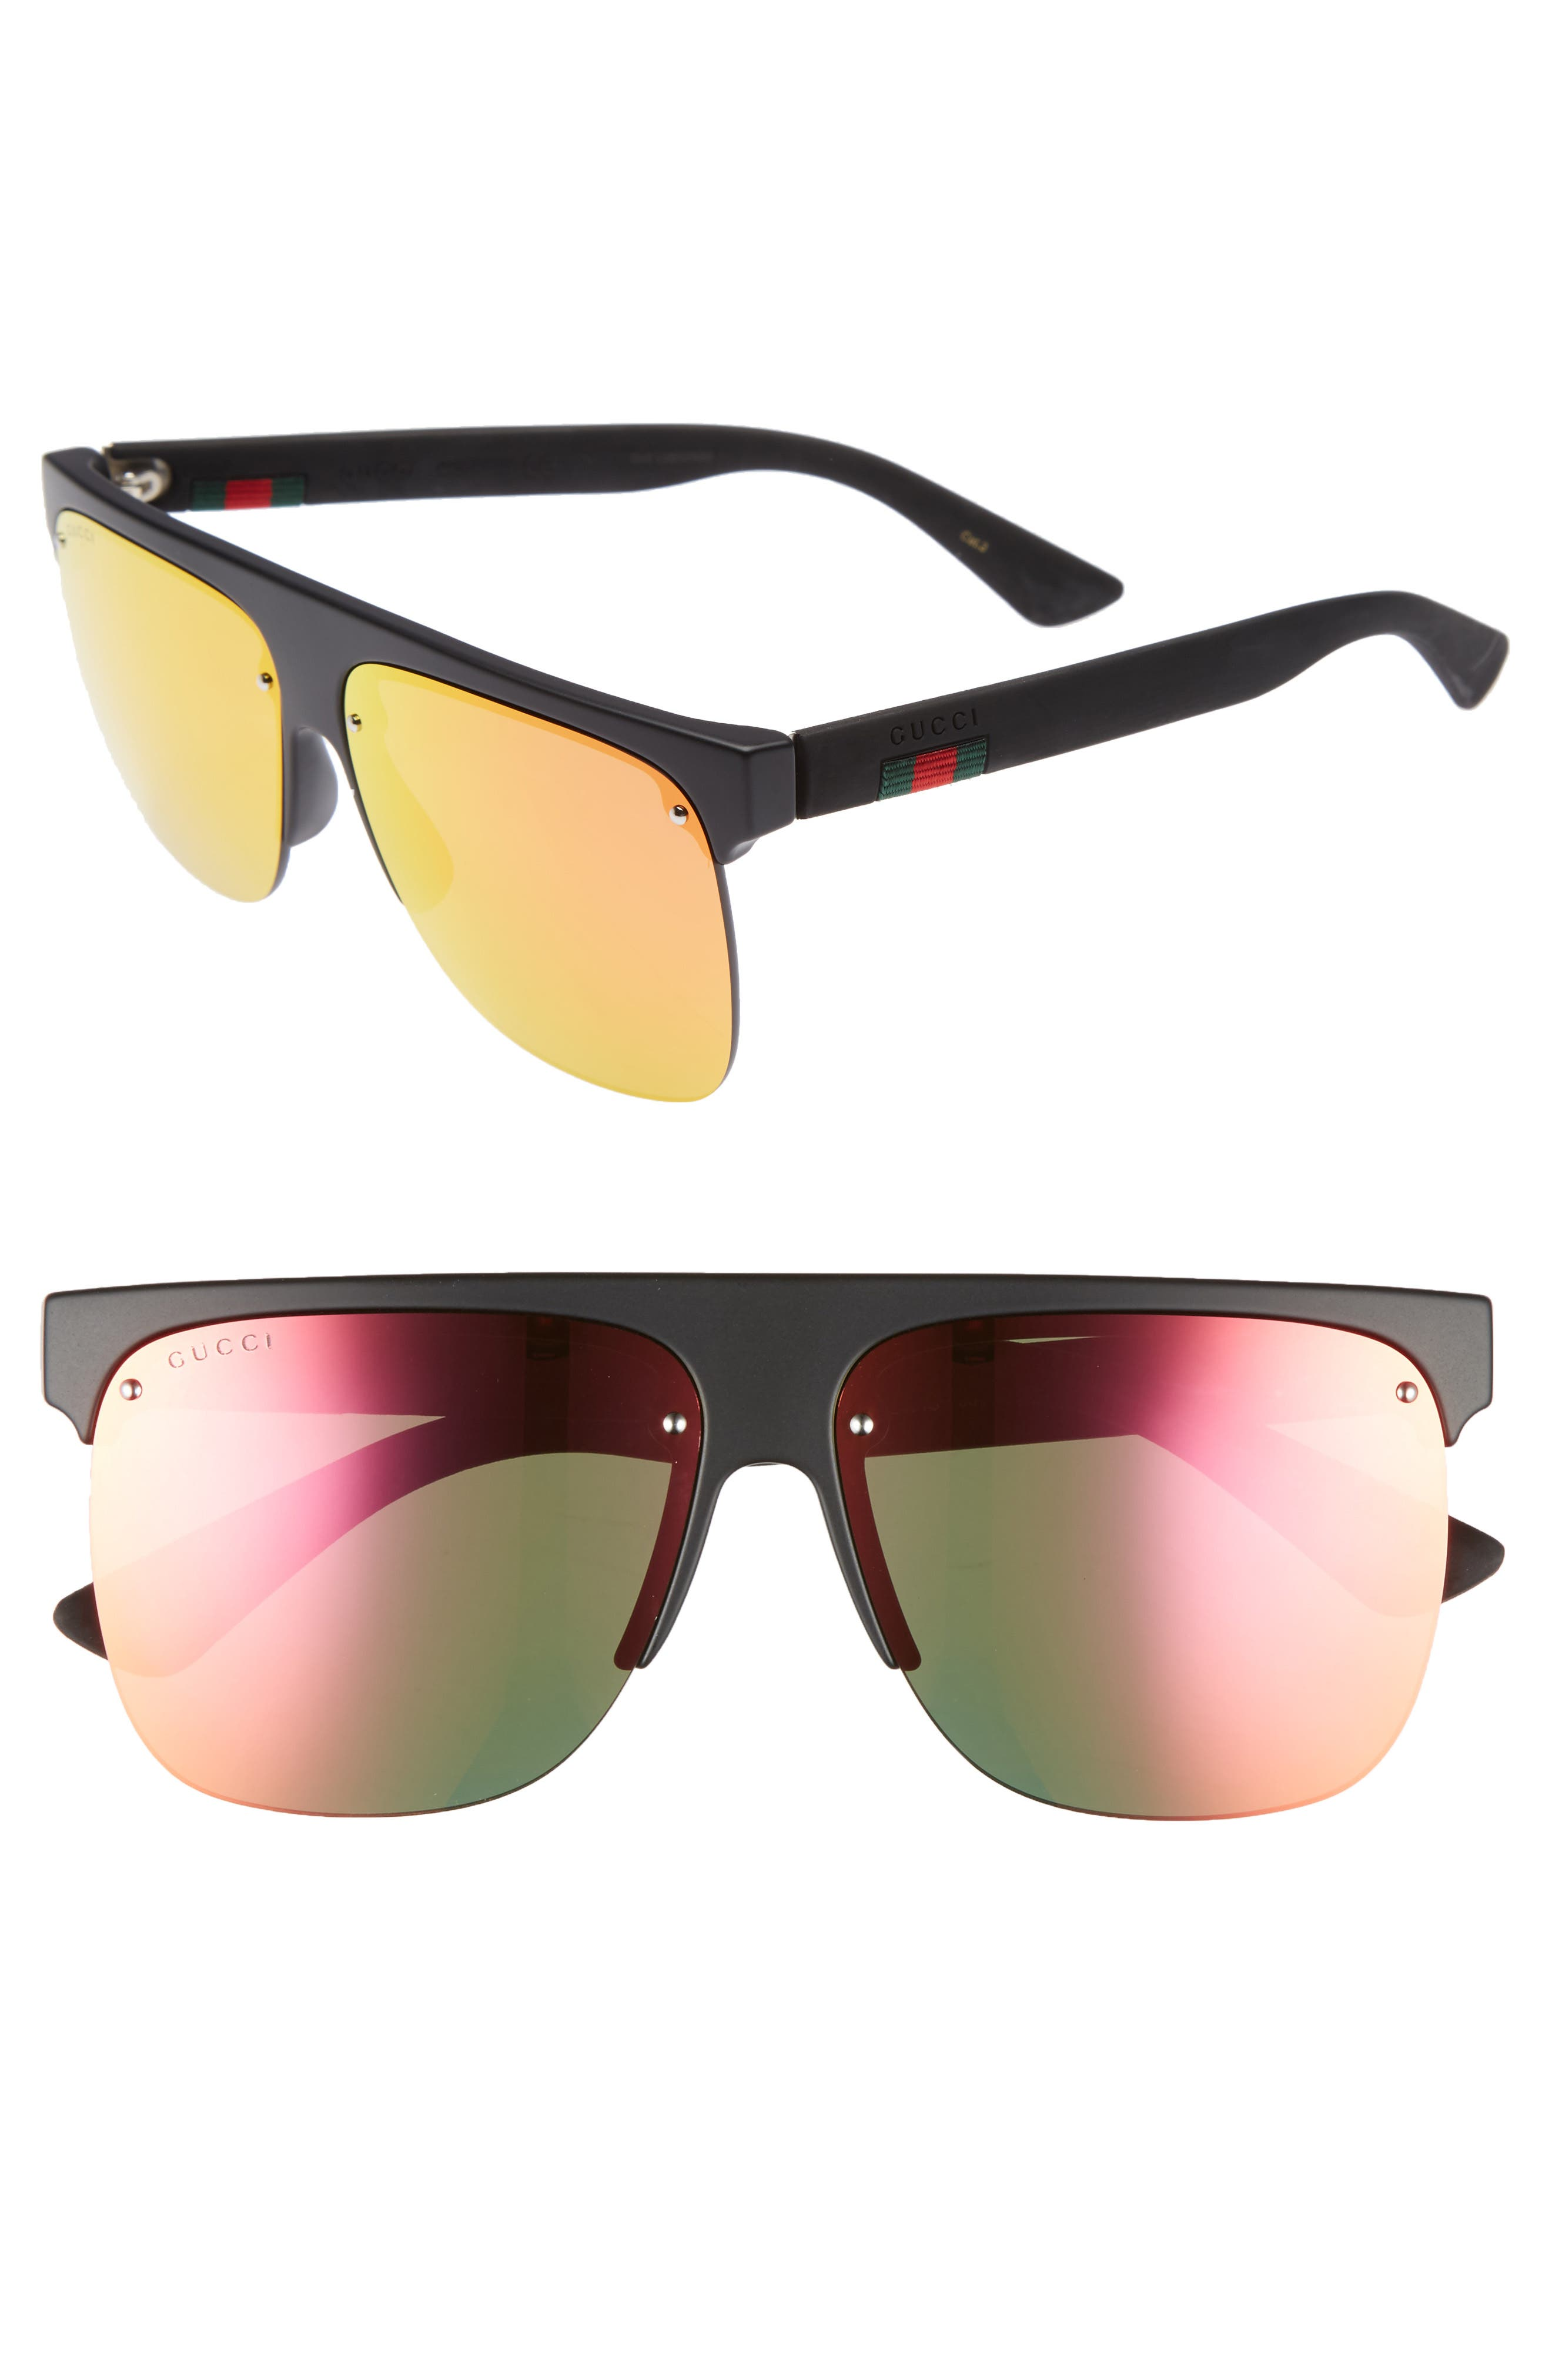 60mm Semi Rimless Polarized Sunglasses,                             Main thumbnail 1, color,